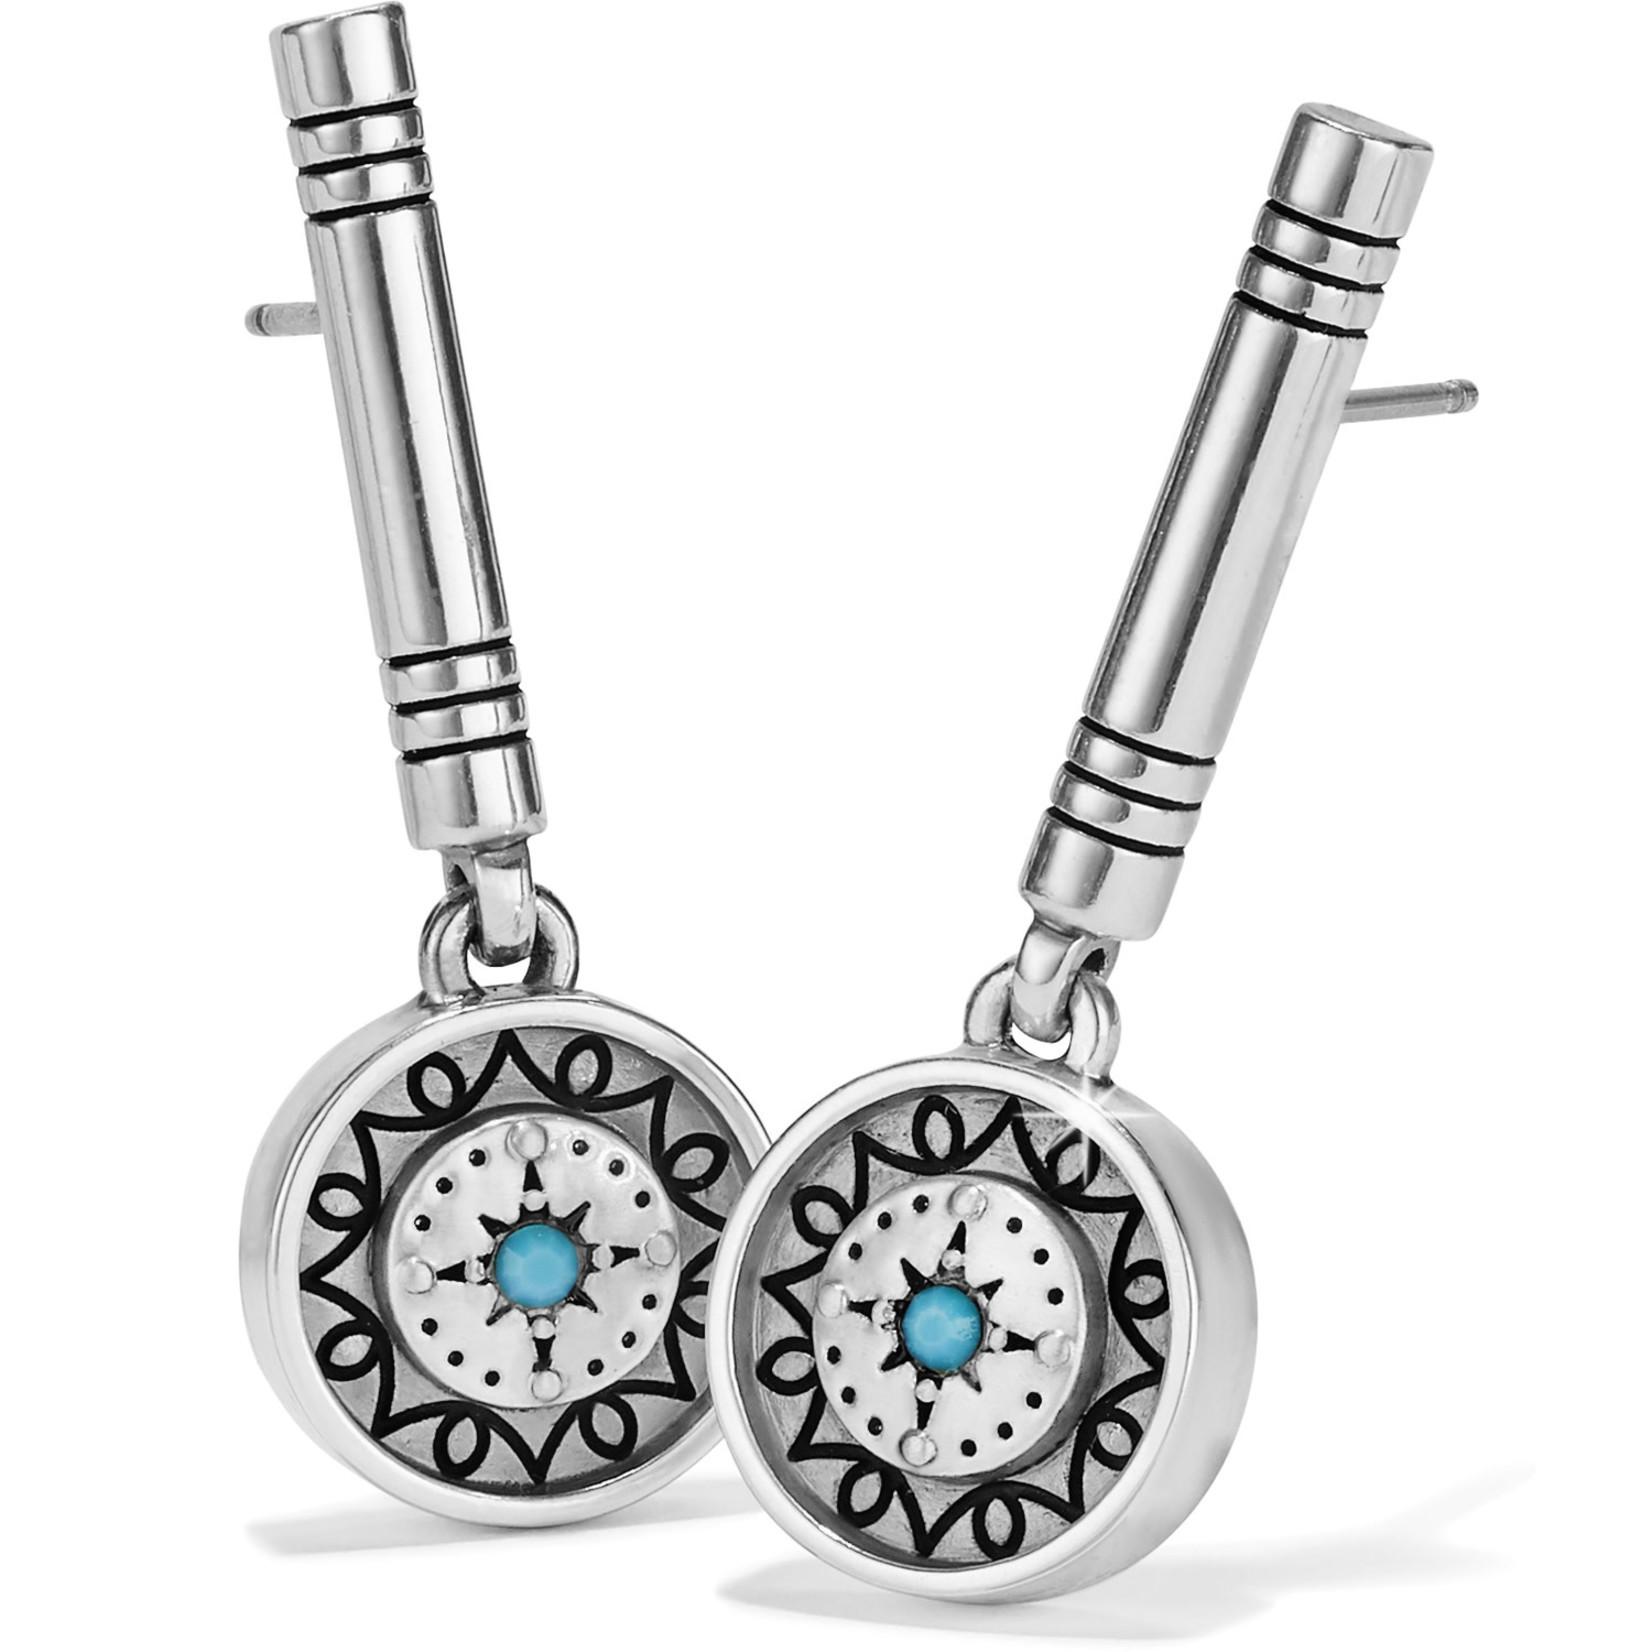 Brighton Marrakesh Mystique Post Drop Earrings Silver-Turquoise